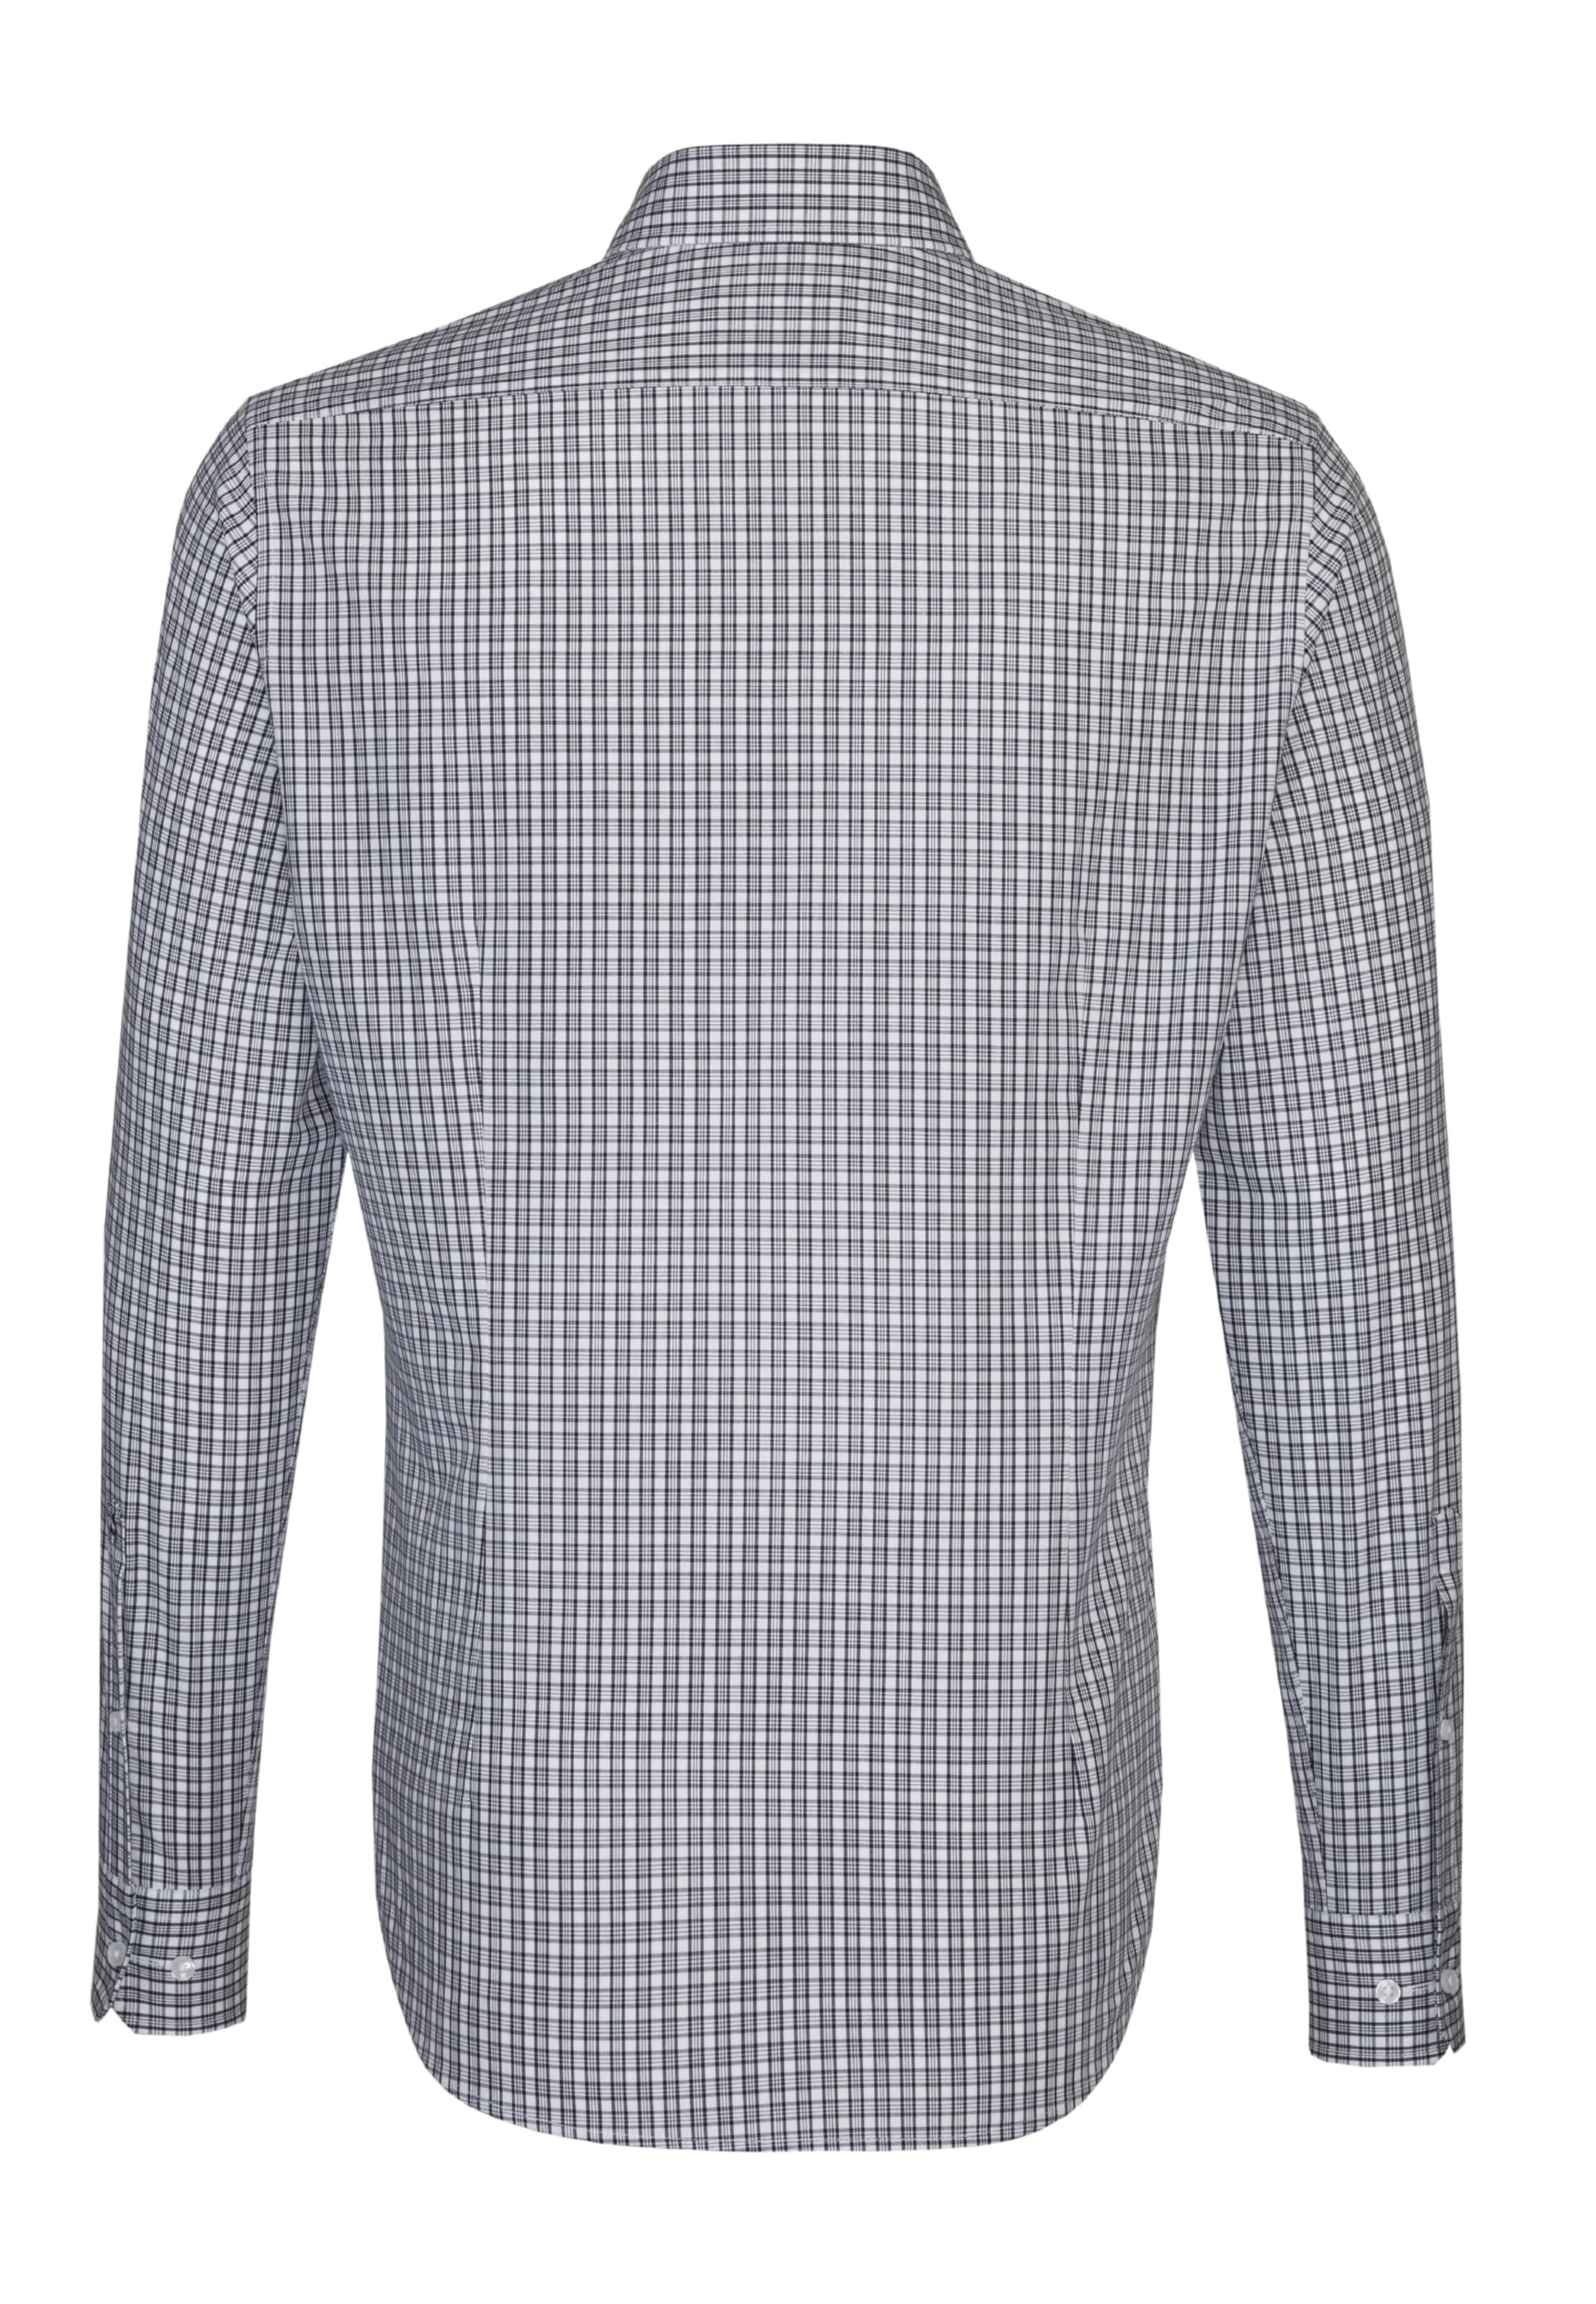 Tailored hemd ' Seidensticker In City Blau ywnvN80mO